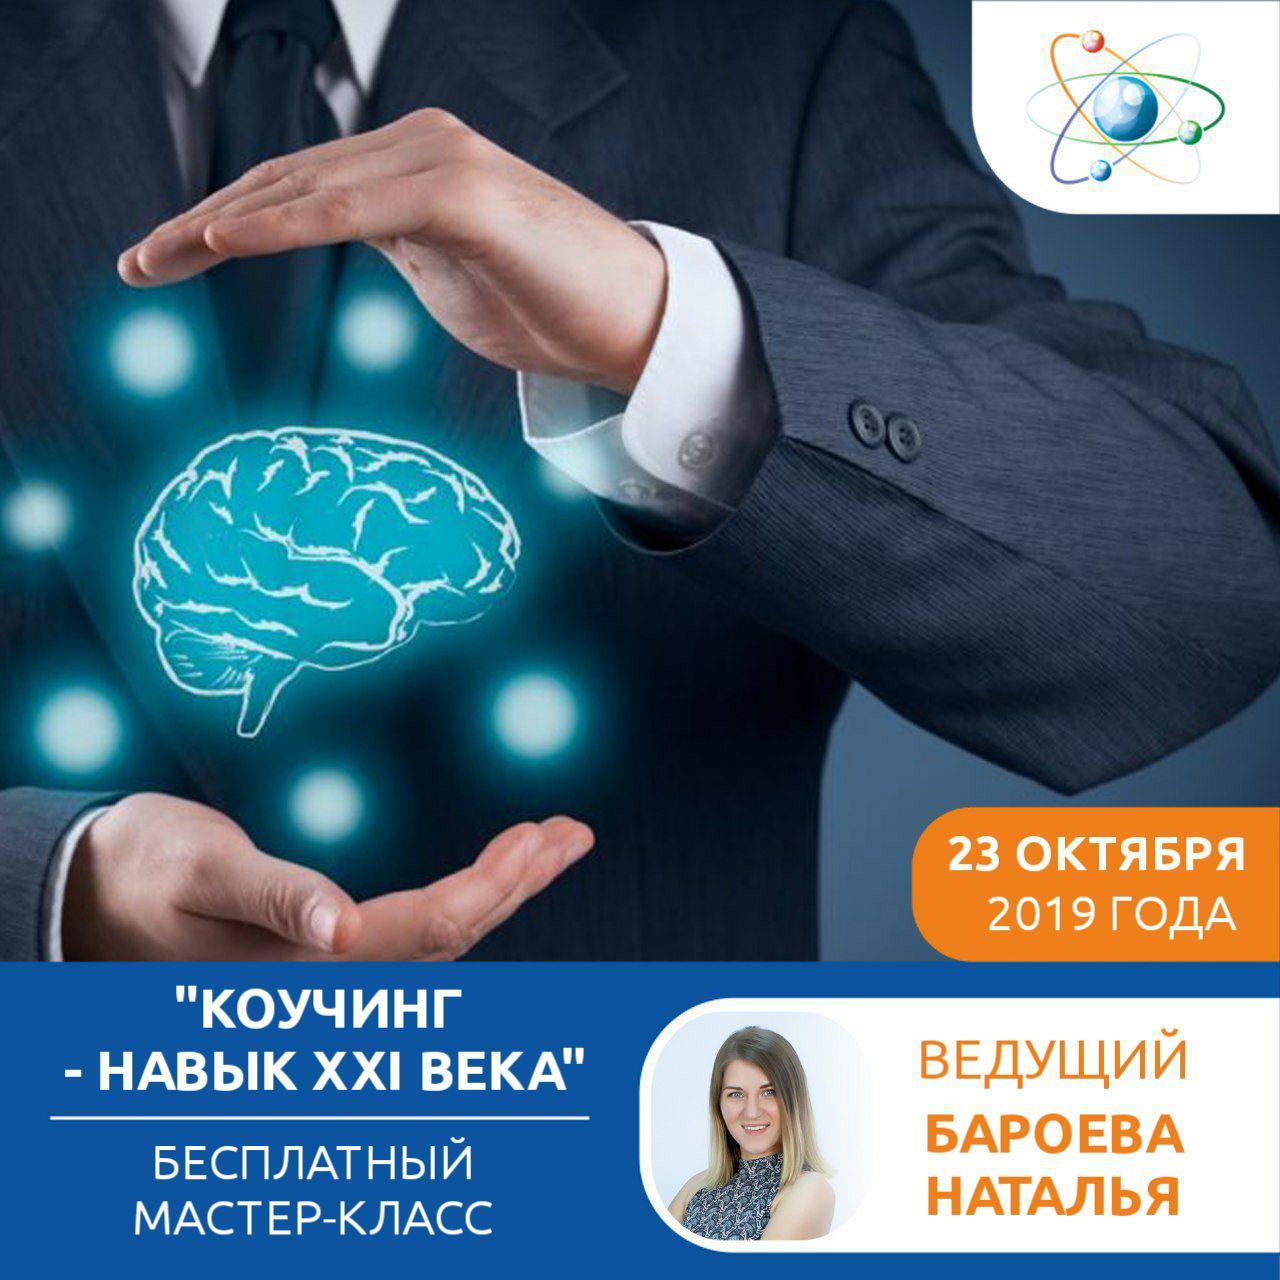 Бесплатный мастер-класс «Коучинг - навык 21 века» @ ул. Жигура, 26а, БЦ «Seven», ауд.2-7, «System ITC»